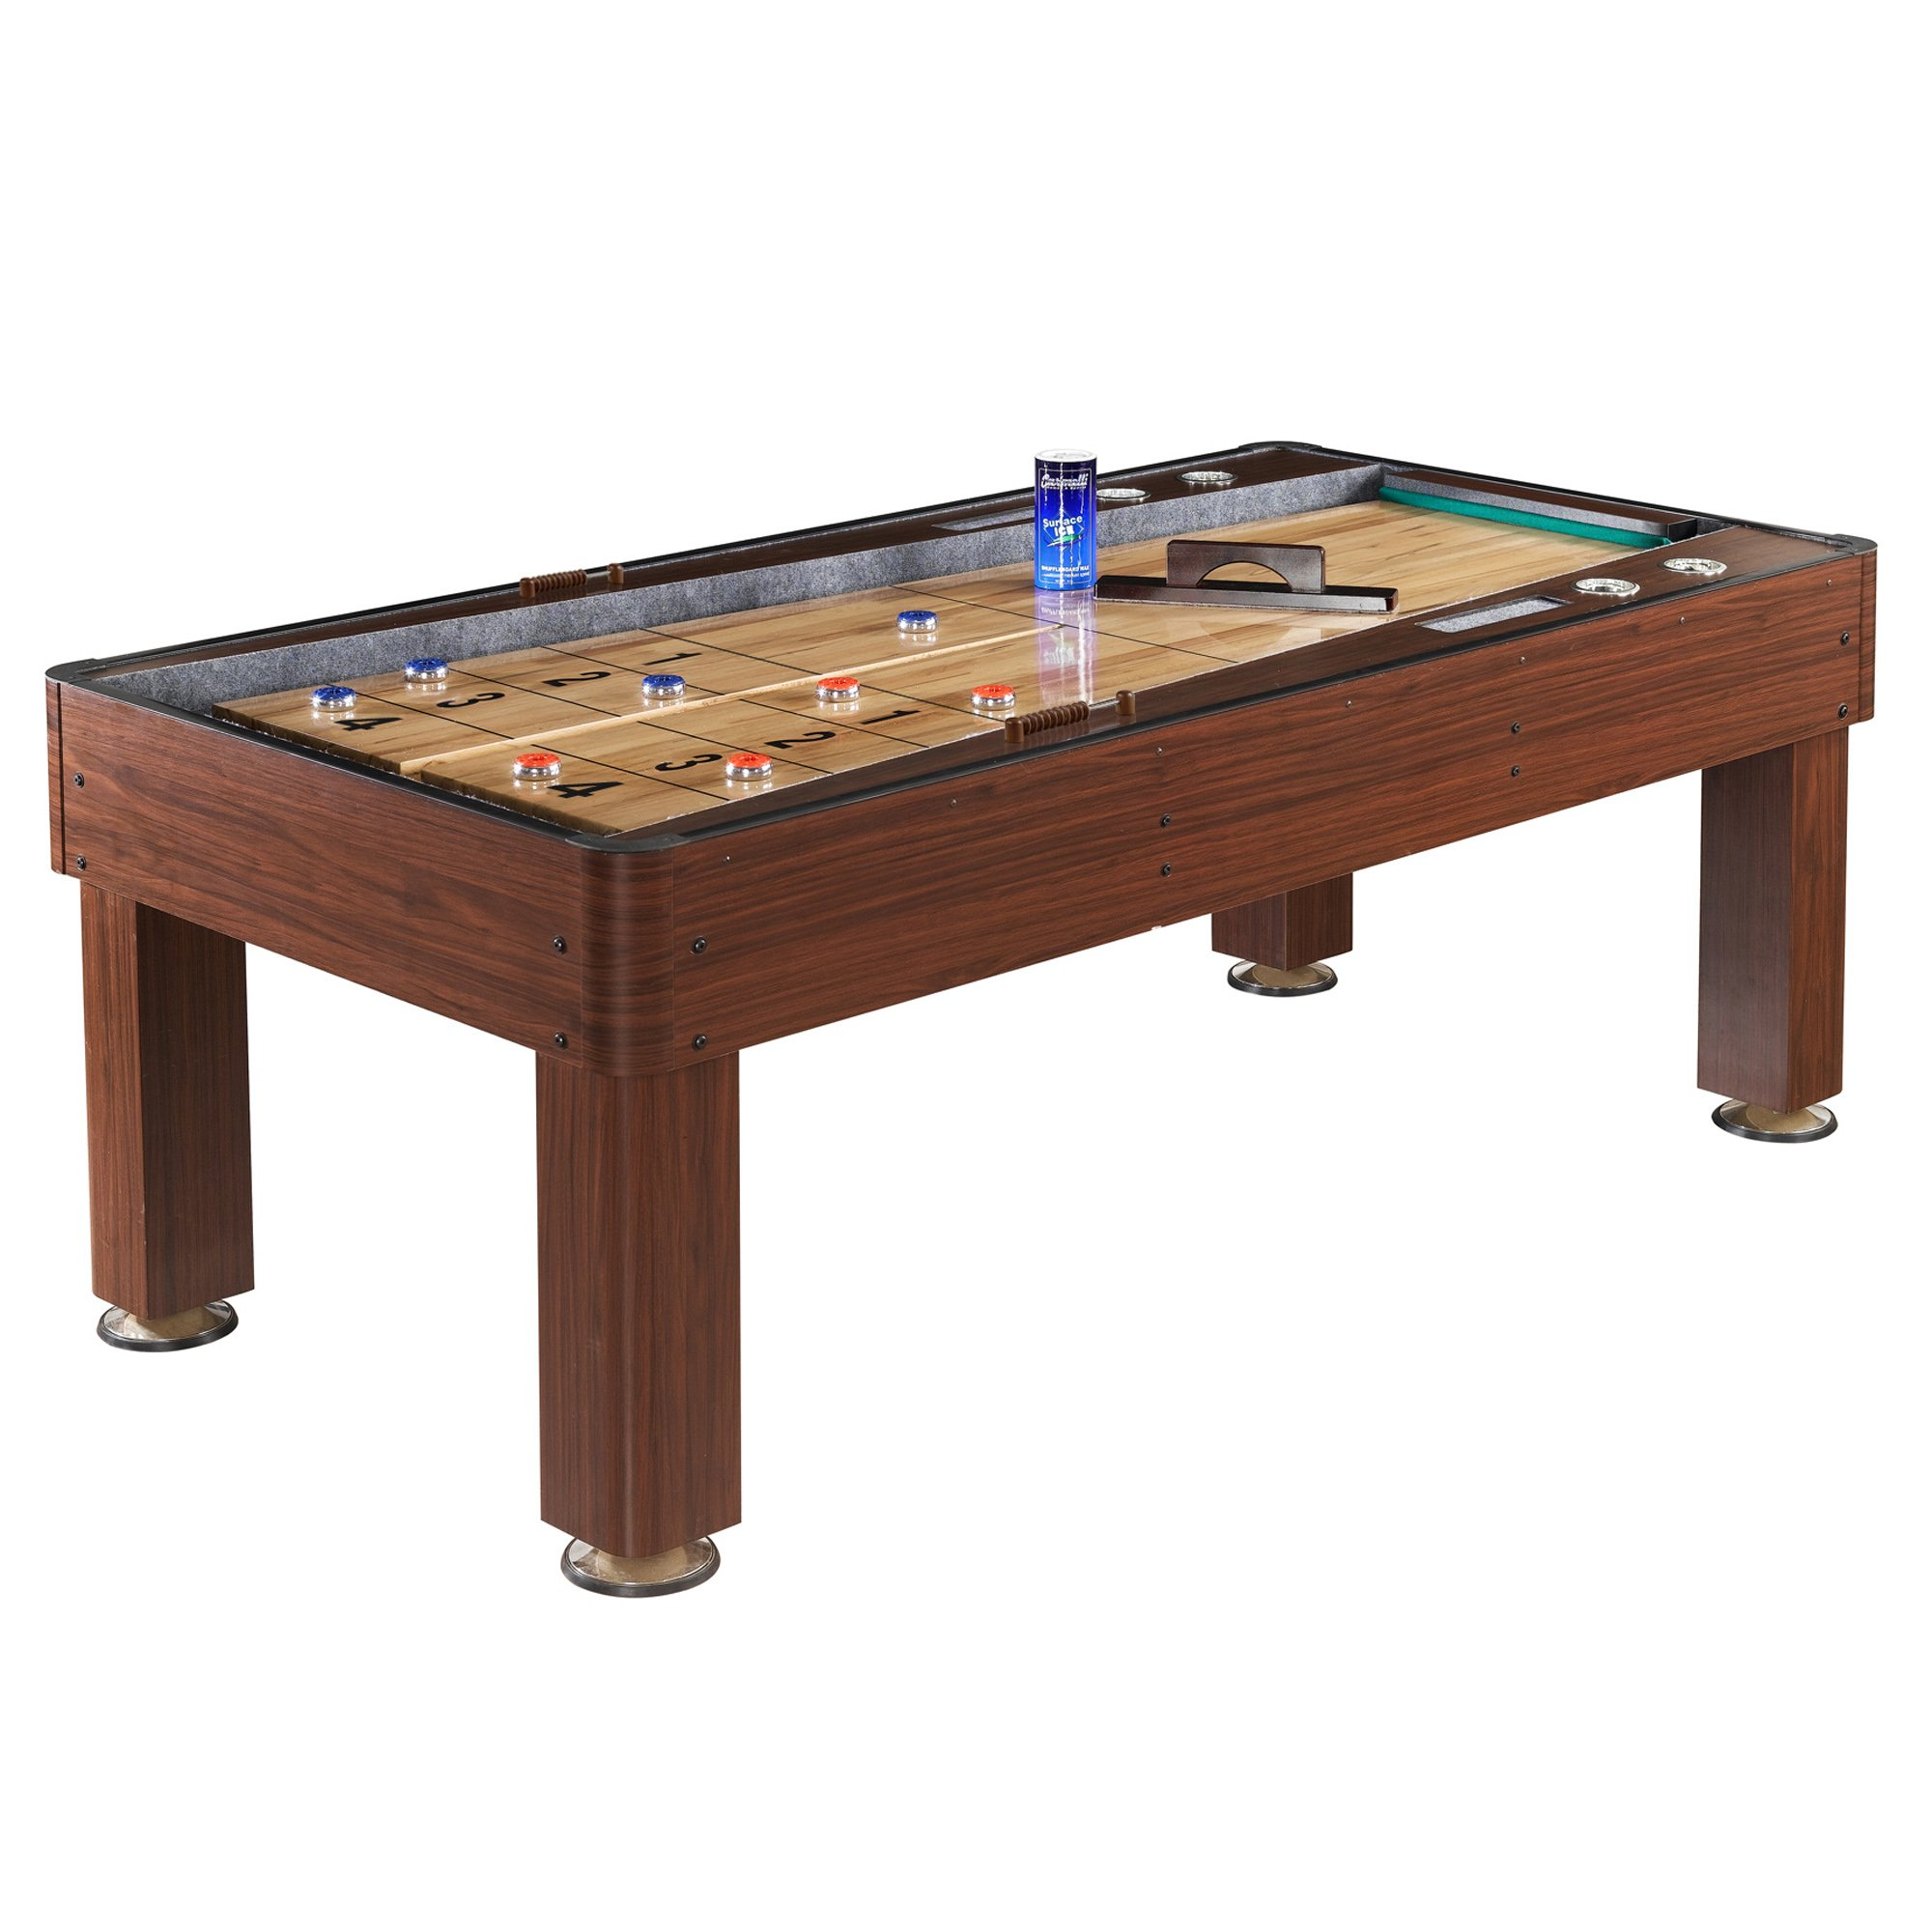 Hathaway Ricochet Shuffleboard Table, Cherry Finish, 7-Feet by Hathaway